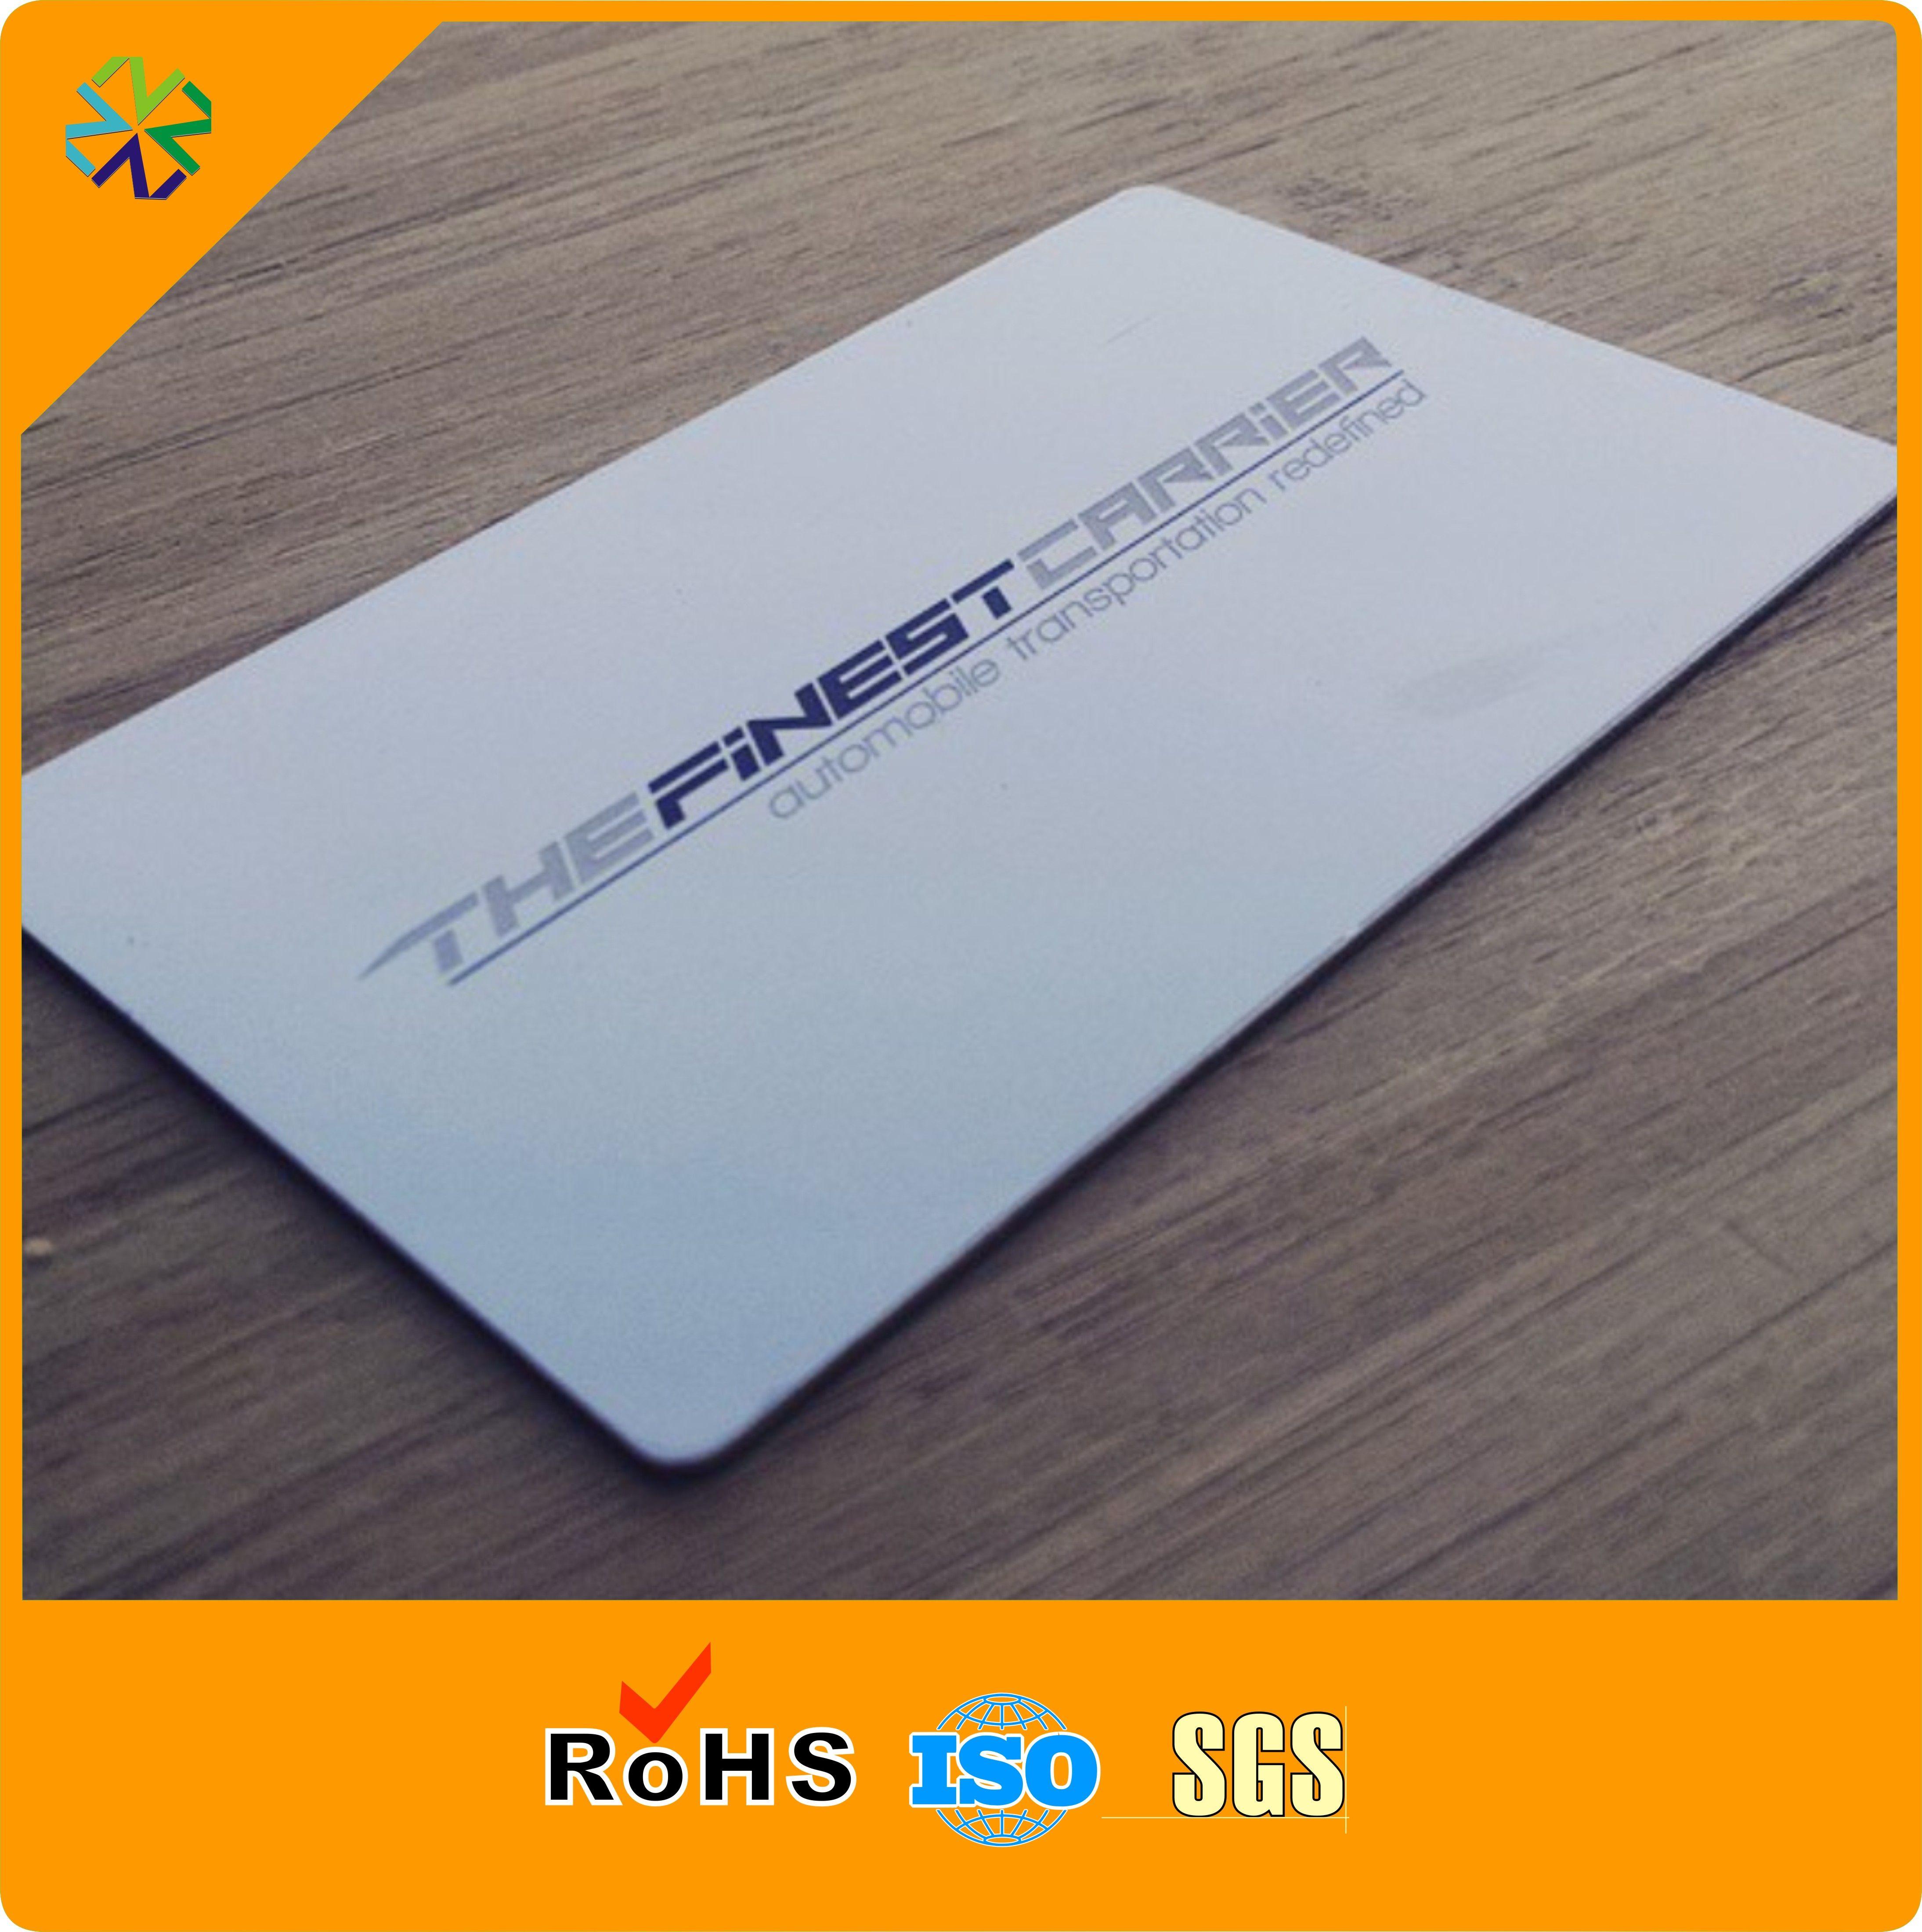 cheap custom logo silk printing vip stainless steel metal name cardblack metal card glossy stainless metal business cards stainless metal business cards - Metal Business Cards Cheap